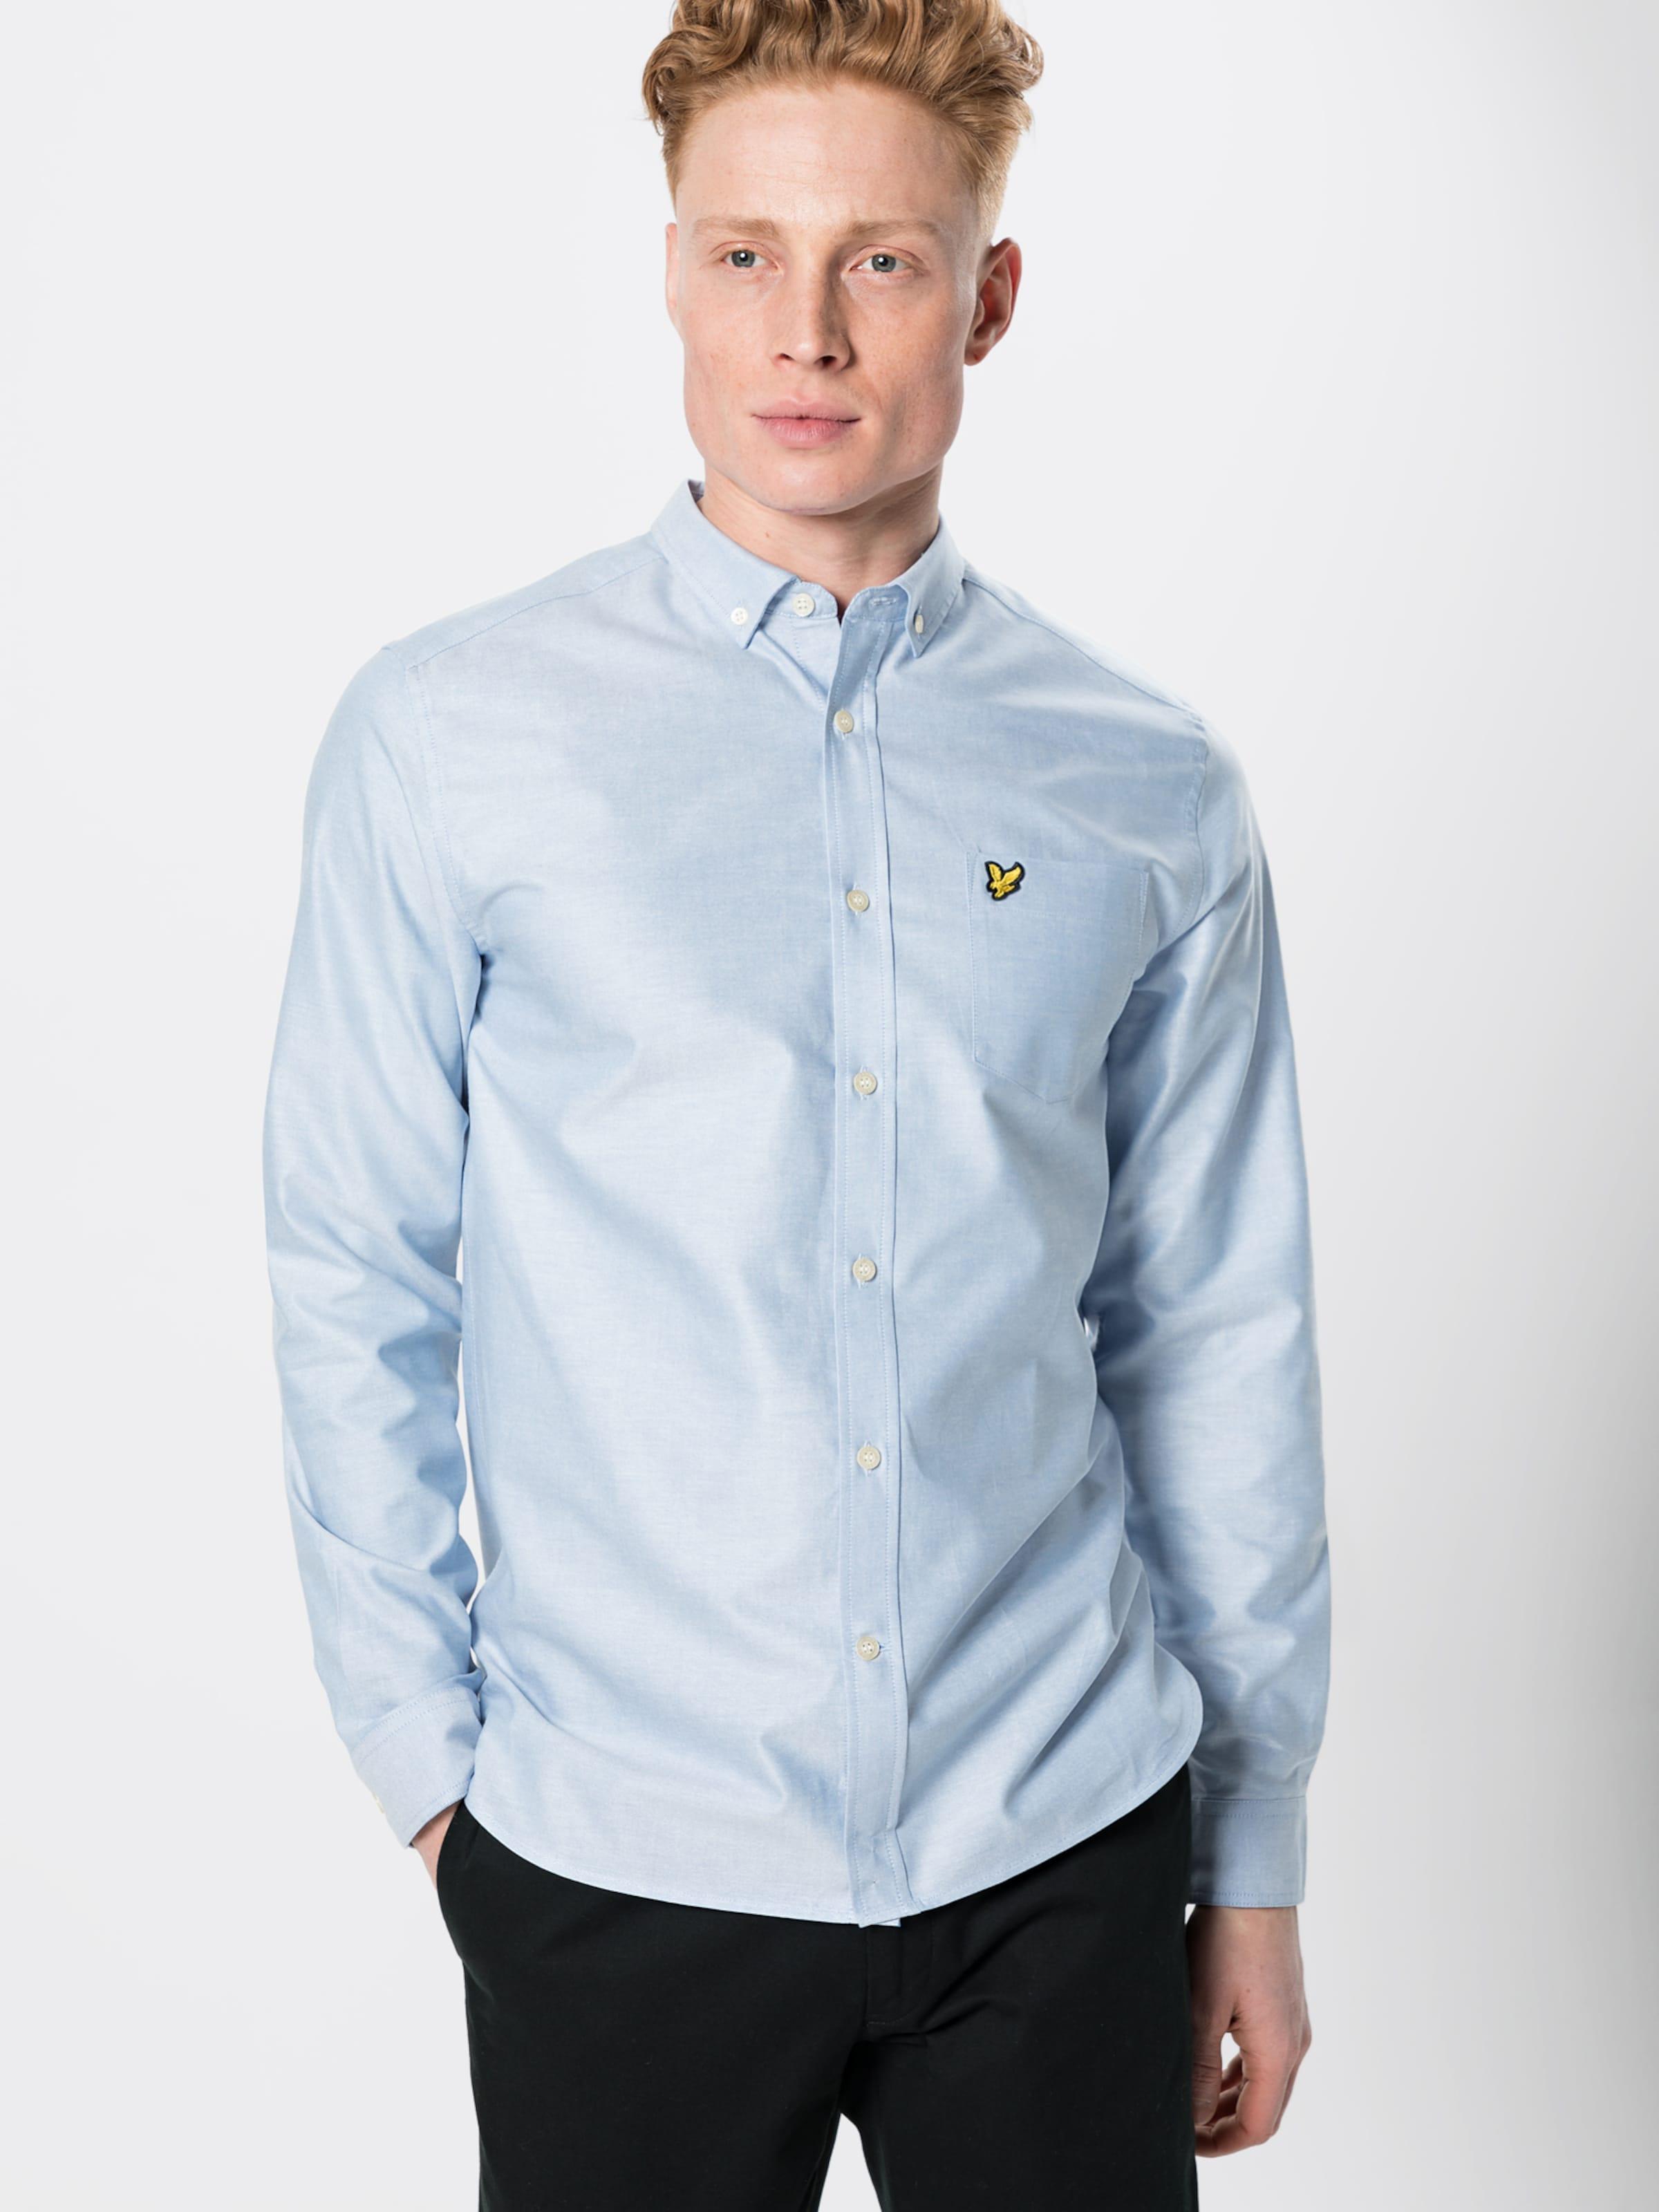 Shirt' Chemise 'oxford Lyleamp; En Bleu Clair Scott 6bgyf7